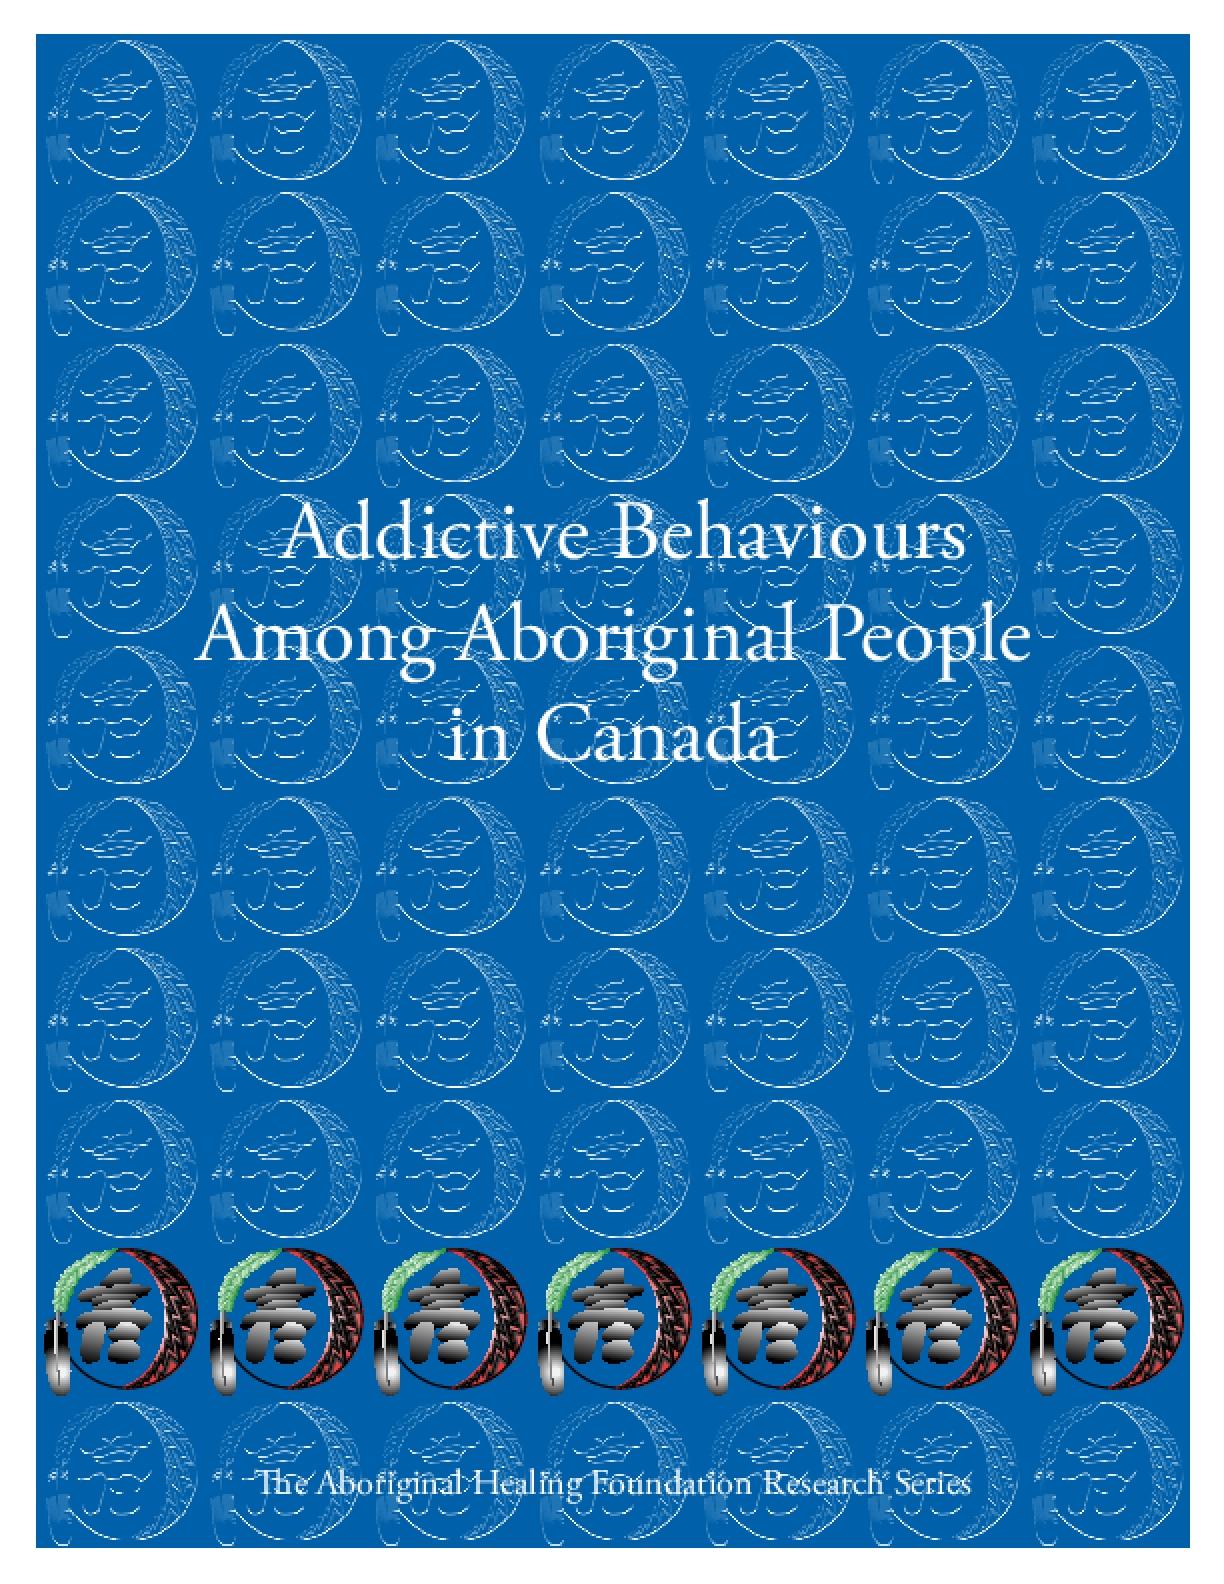 Addictive Behaviors Among Aboriginal People in Canada